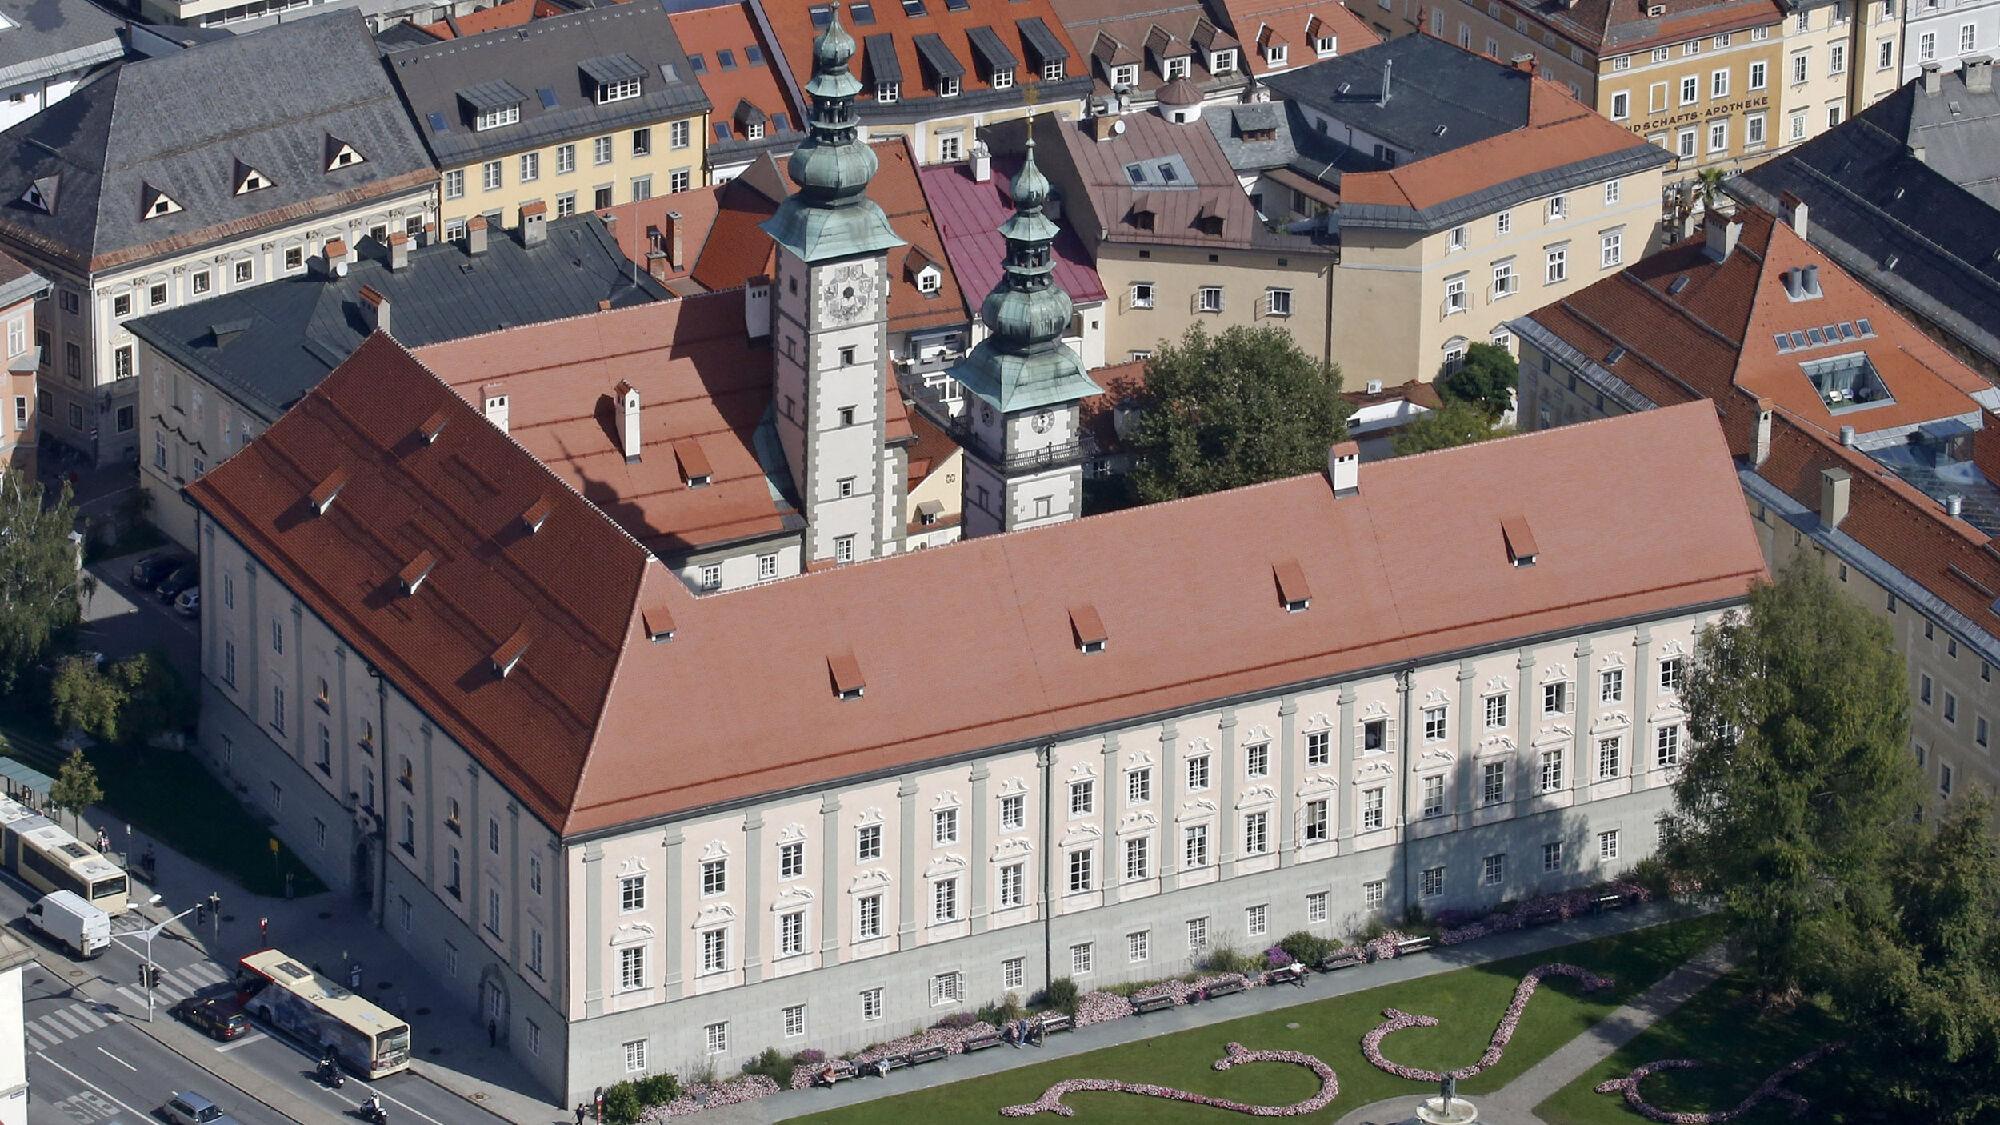 Blick auf das Landhaus Klagenfurt